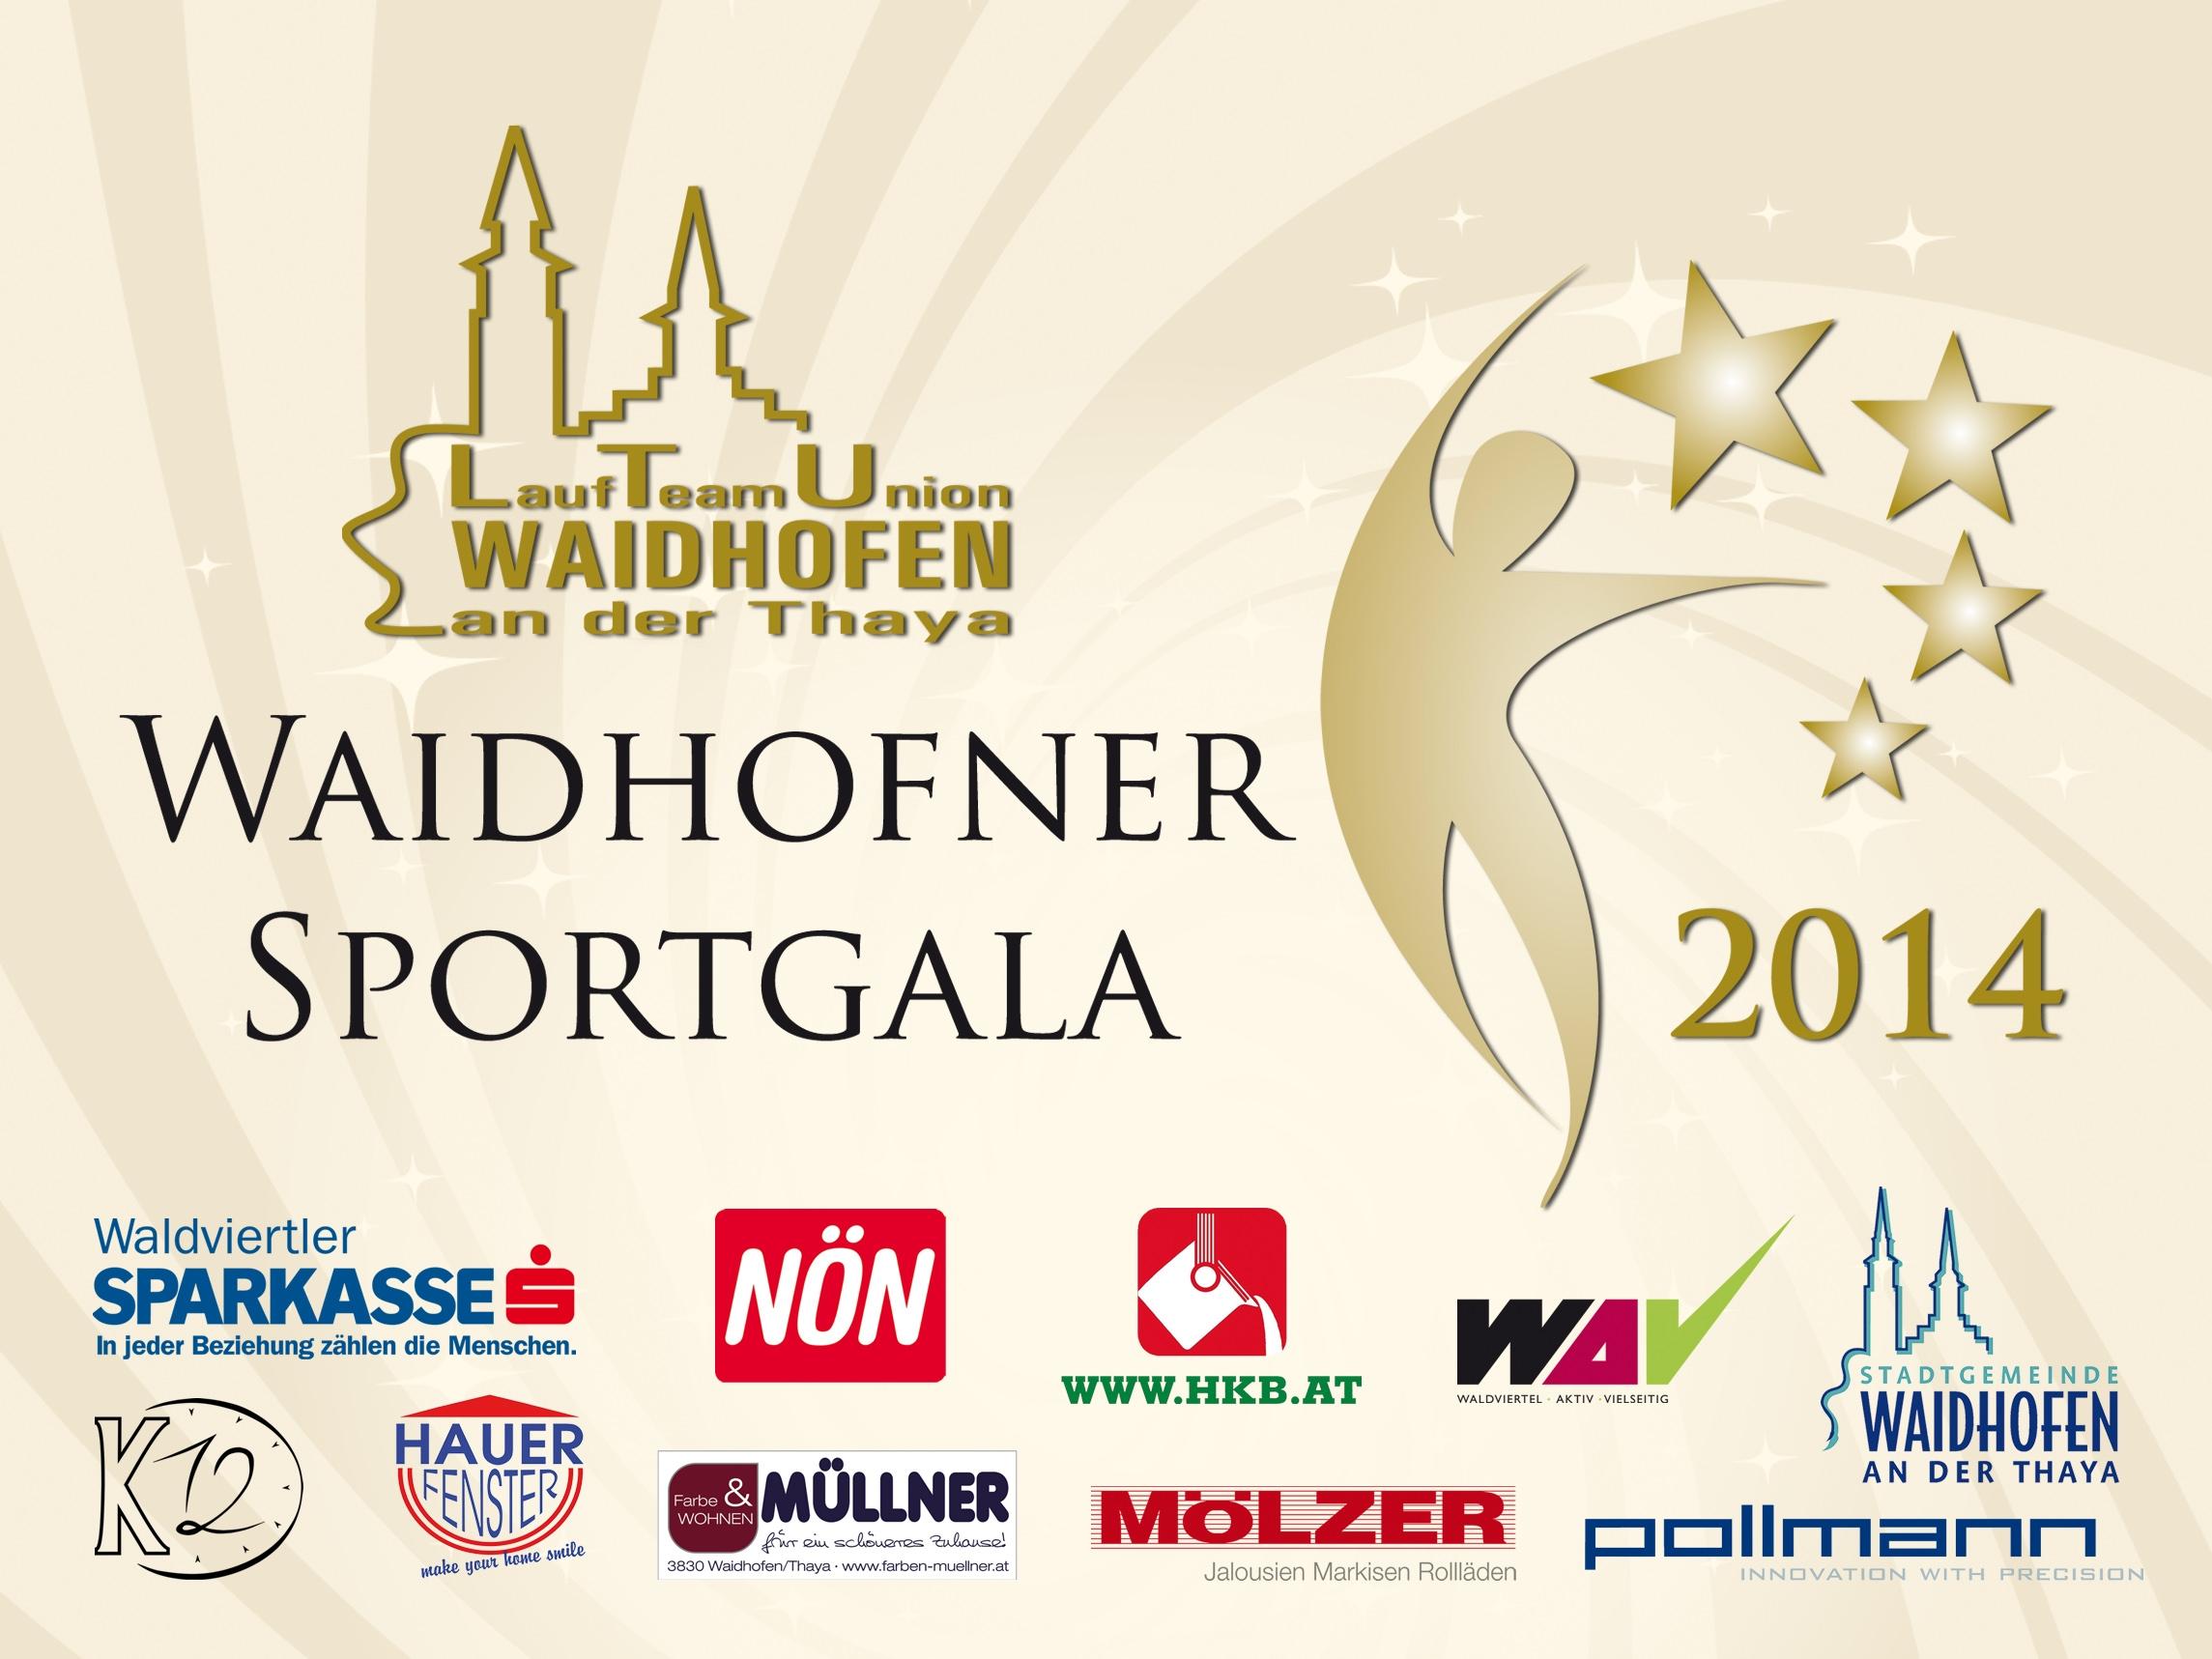 Waidhofner Sportgala